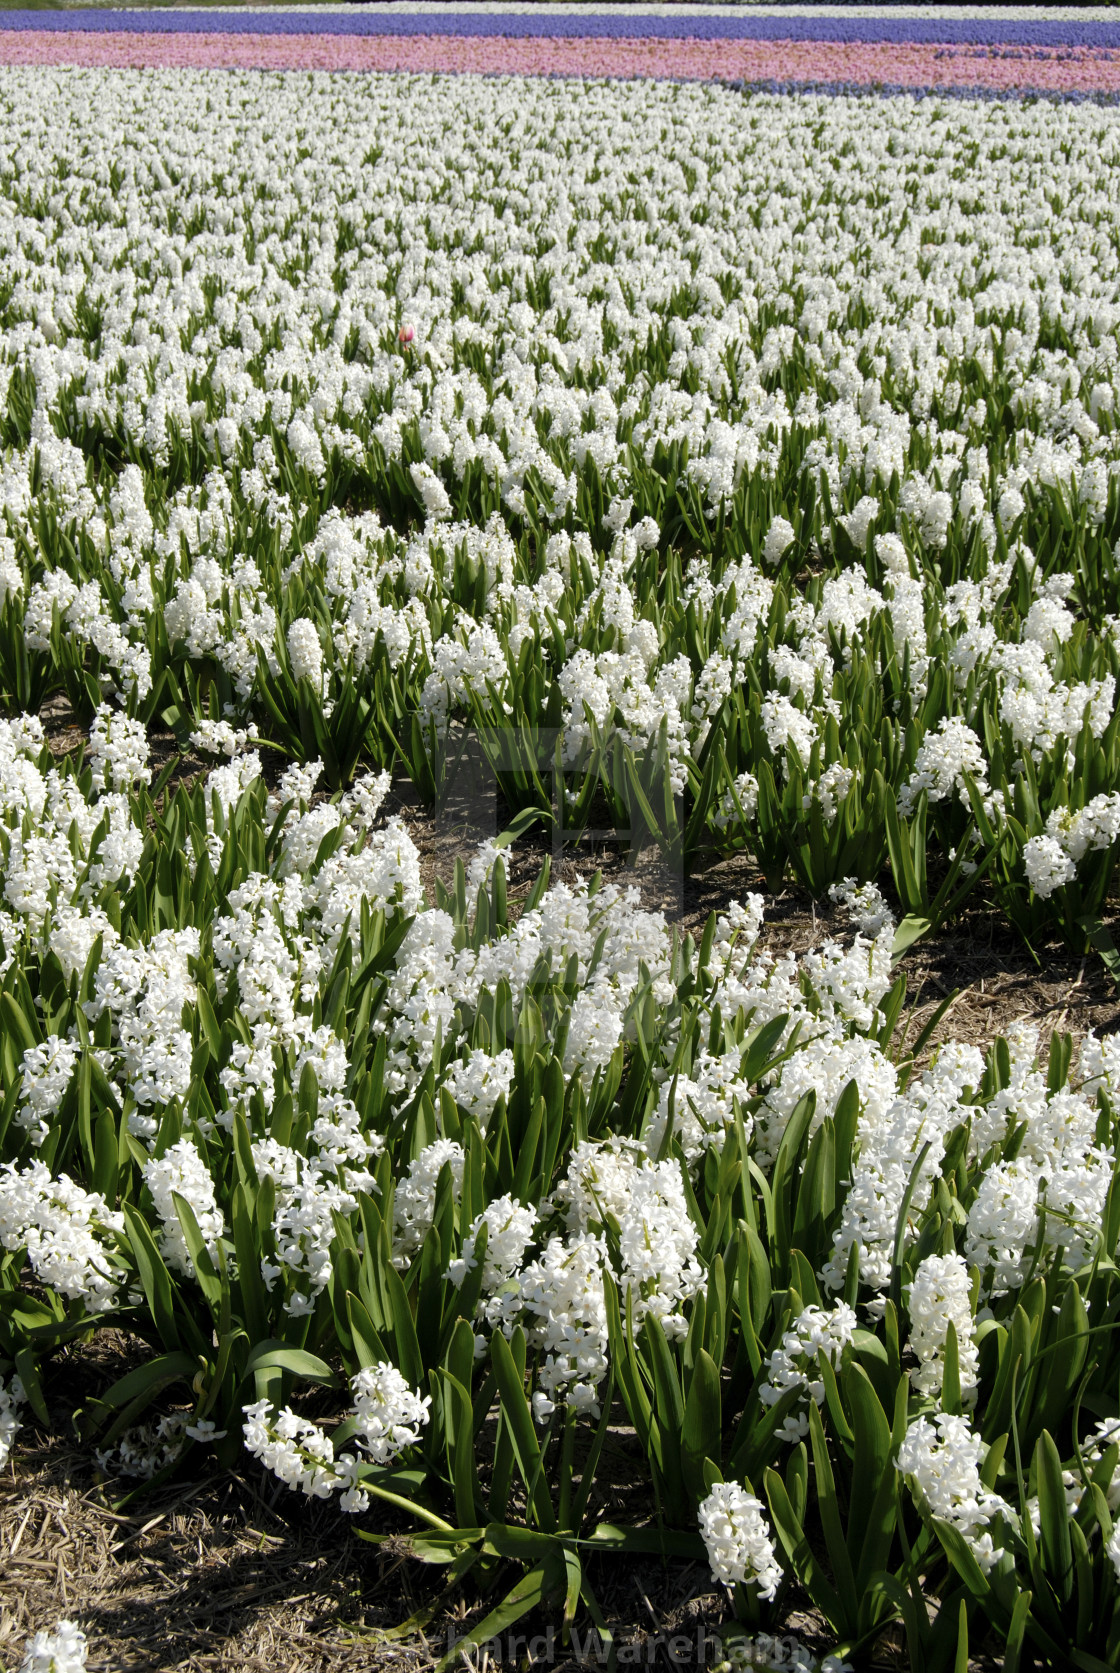 De Zilk Nr Lisse The Netherlands Fields Of White Hyacinths In The